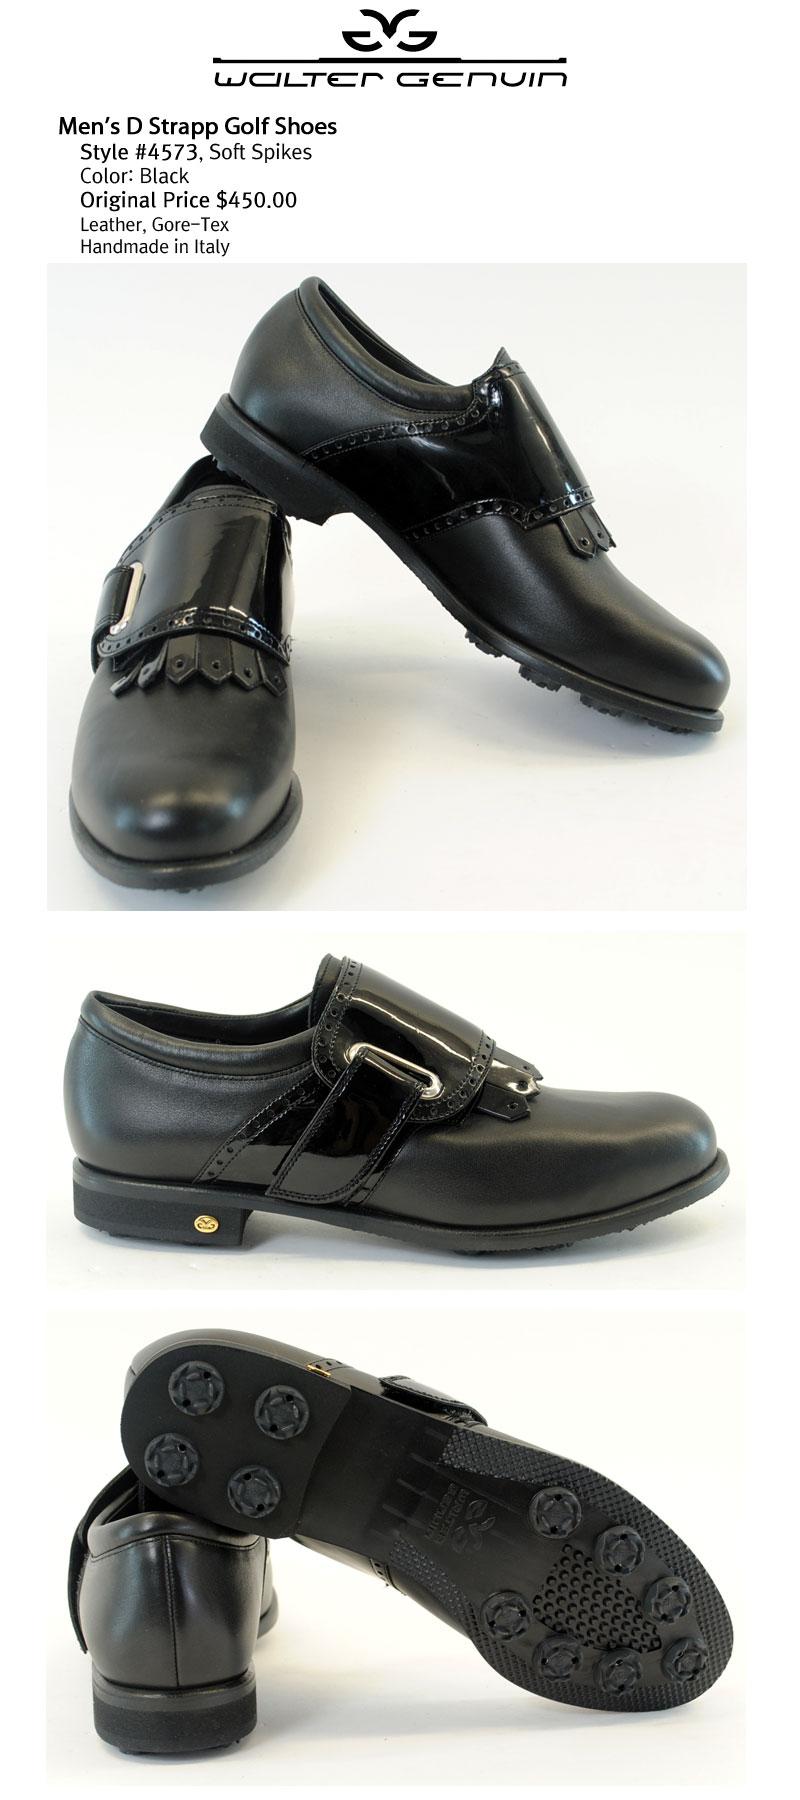 Walter Genuin Mens Golf Shoes